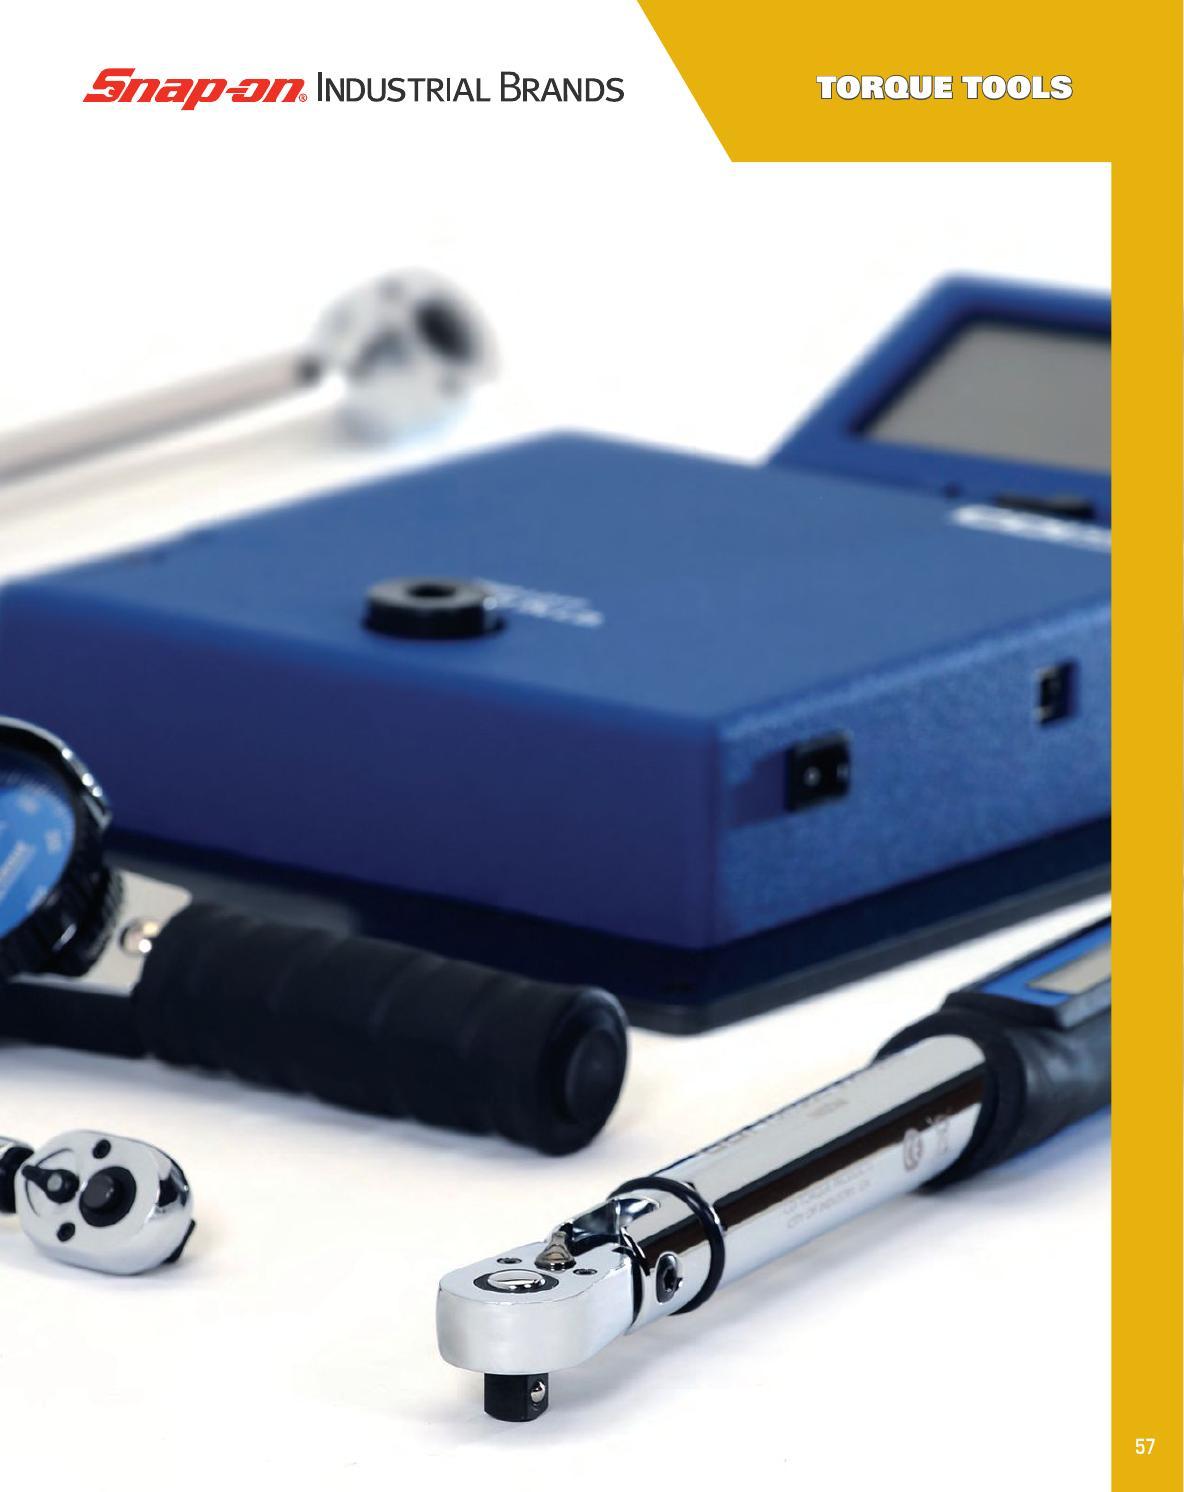 CDI Torque TCQZX46ADP 1-7//16-Inch 12 Point Box End Dual Pin Z Head Snap-on Industrial Brand CDI Torque